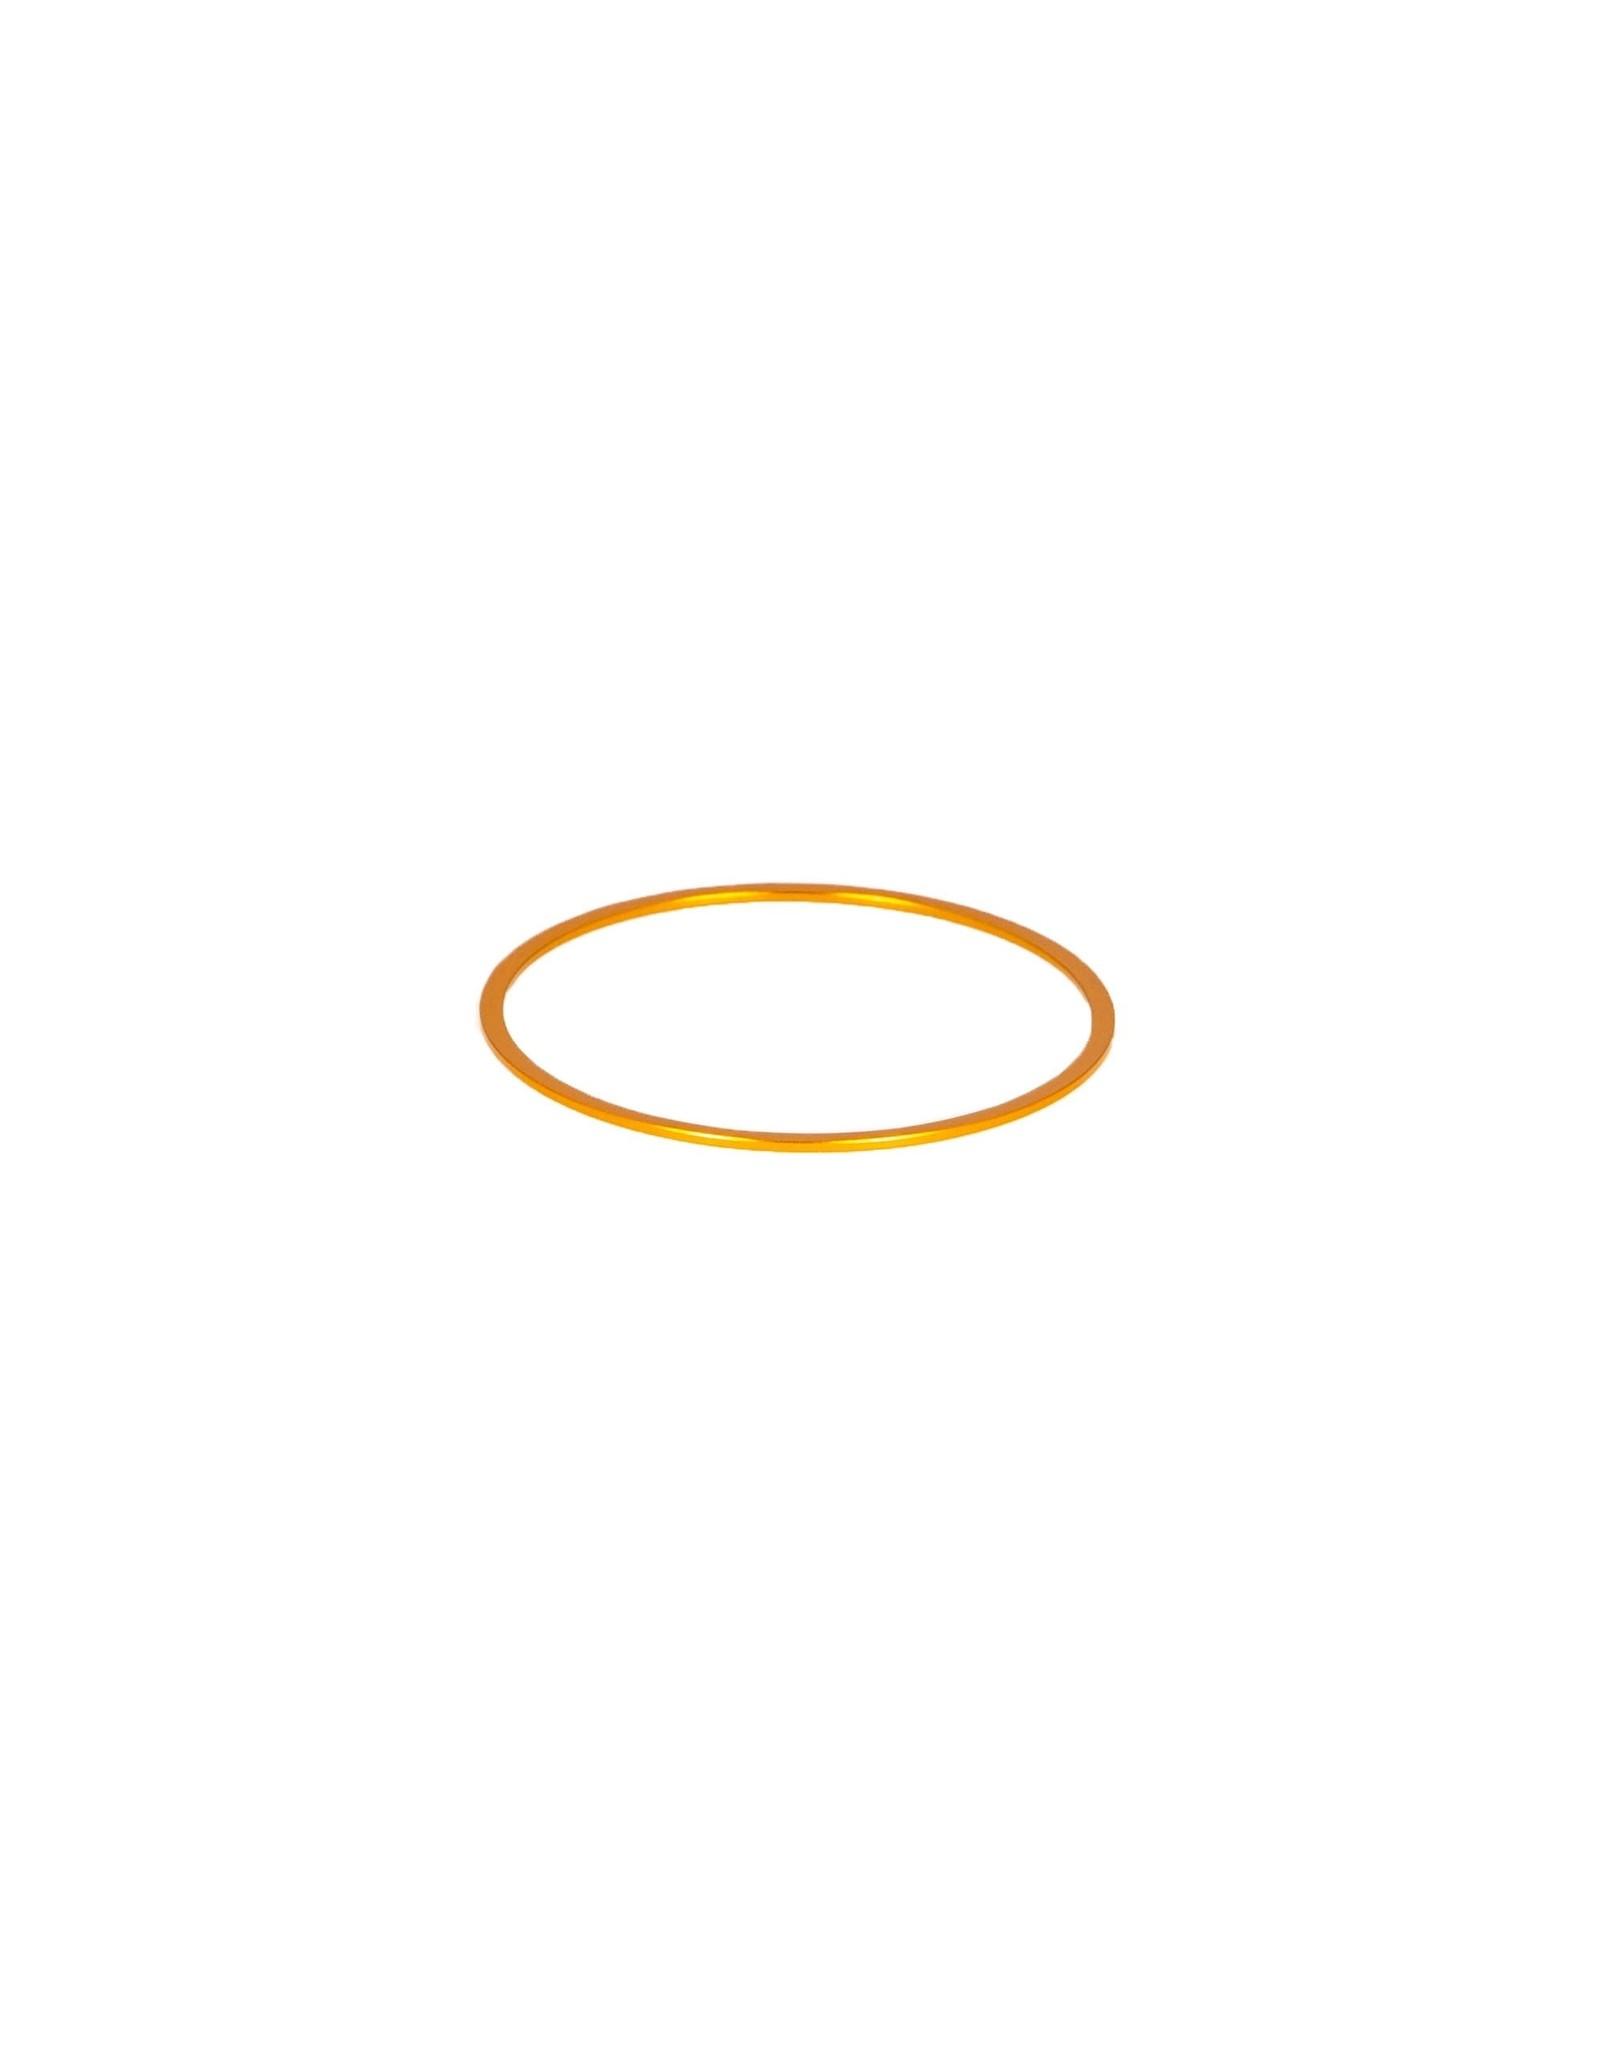 Baader Planetarium Baader M48 Fine-Adjustment Aluminum ring (Choose Size)